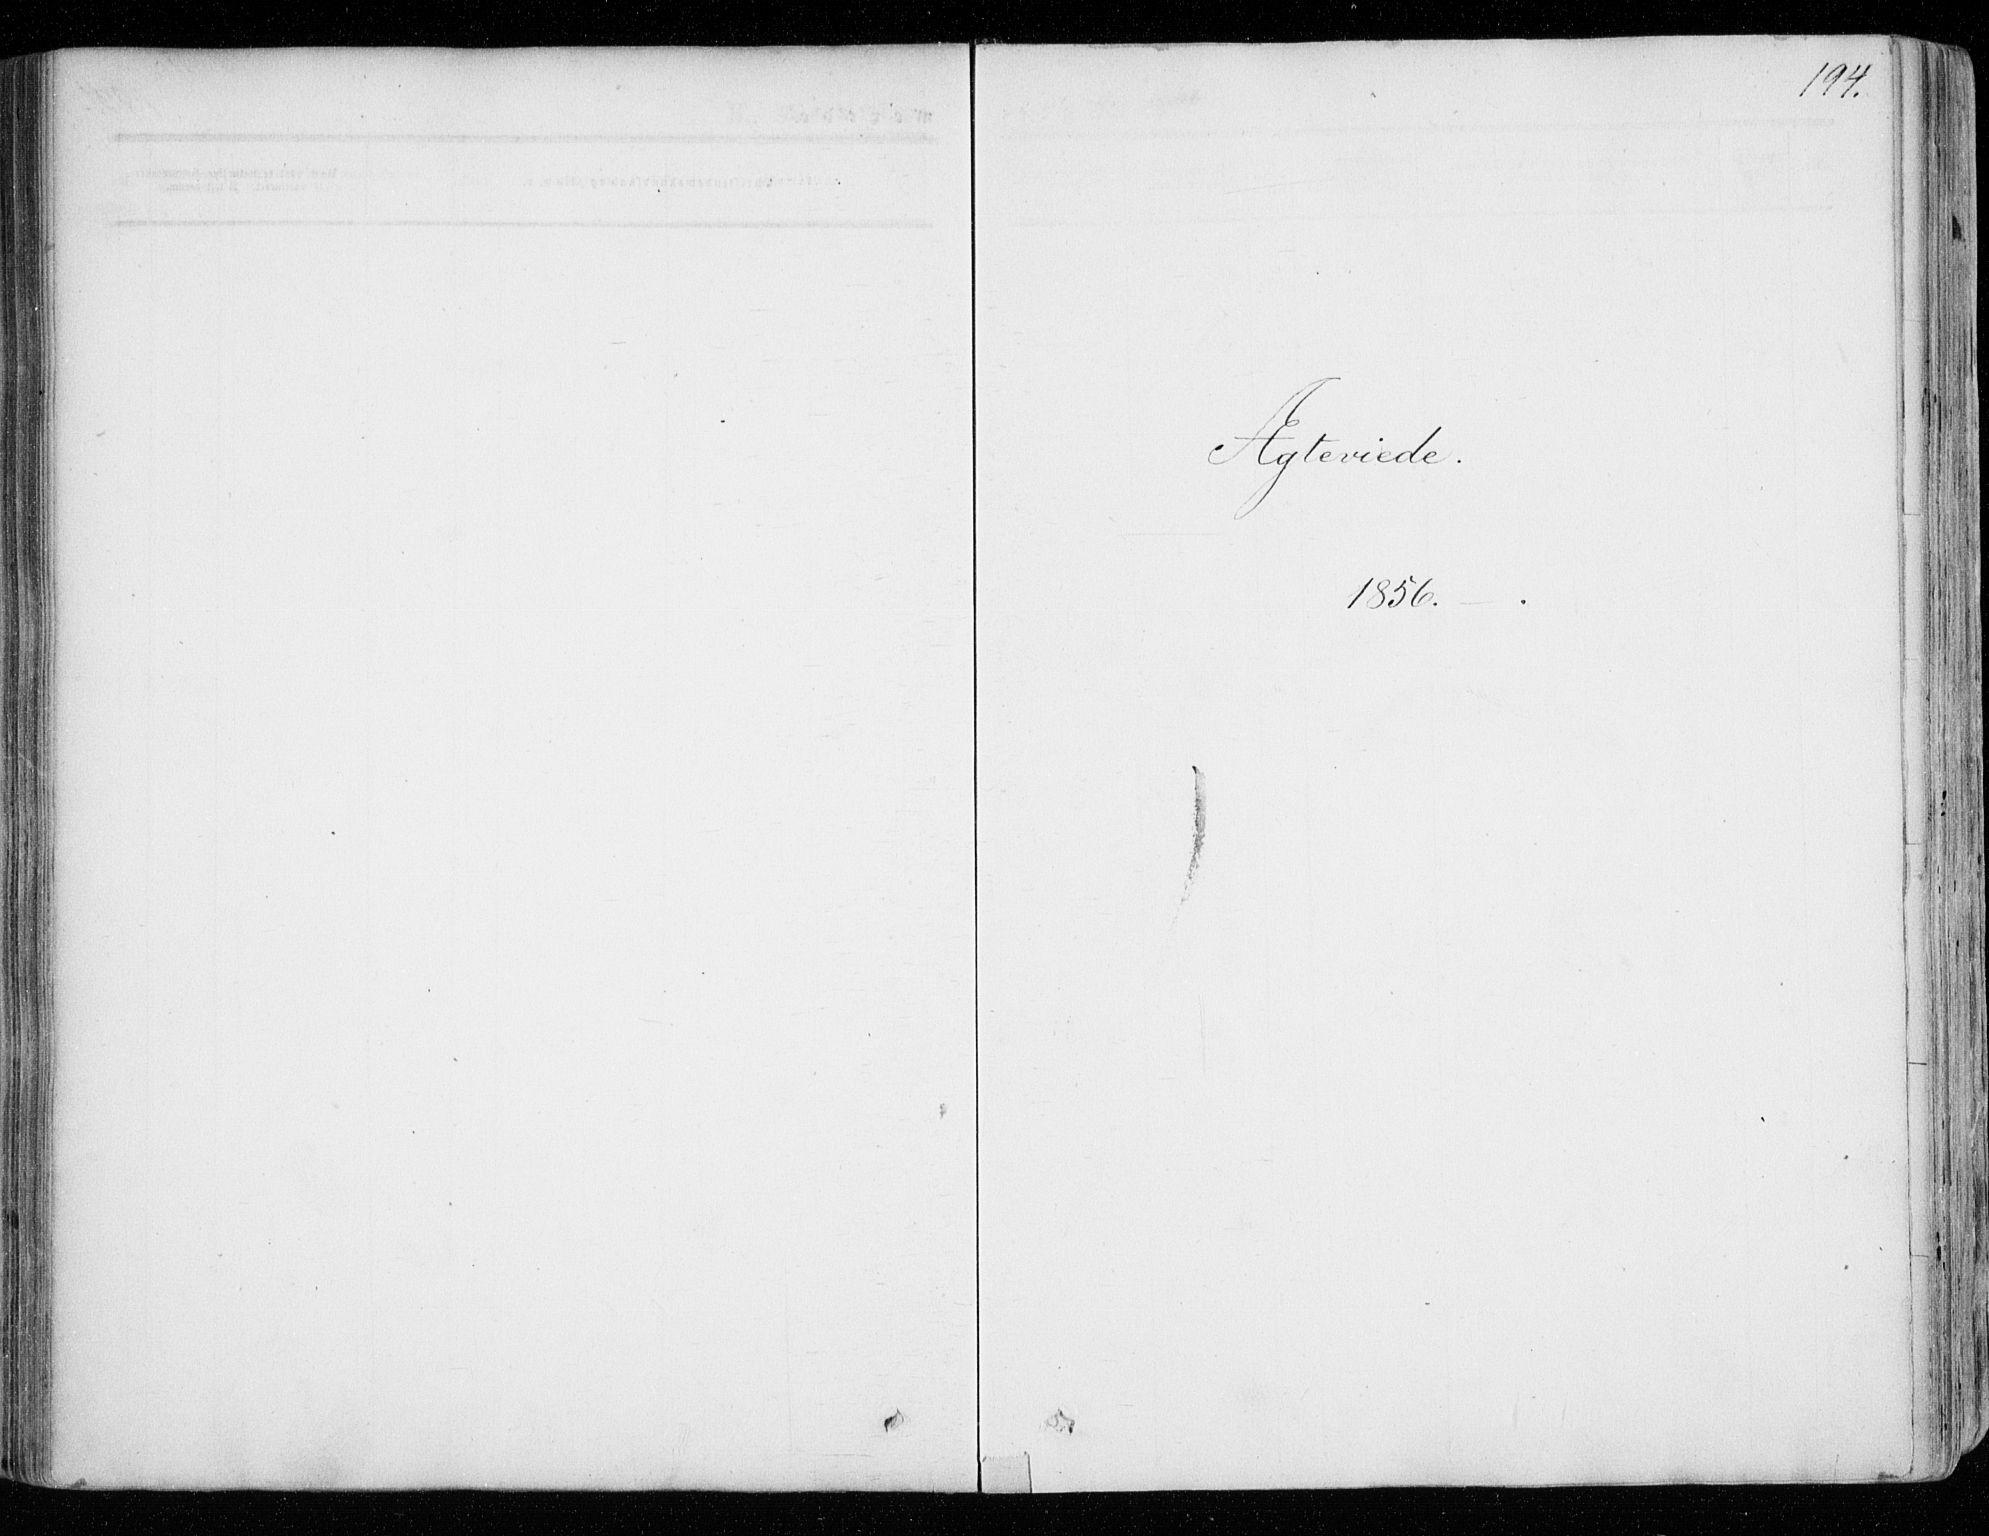 SATØ, Tranøy sokneprestkontor, I/Ia/Iaa/L0007kirke: Ministerialbok nr. 7, 1856-1866, s. 194